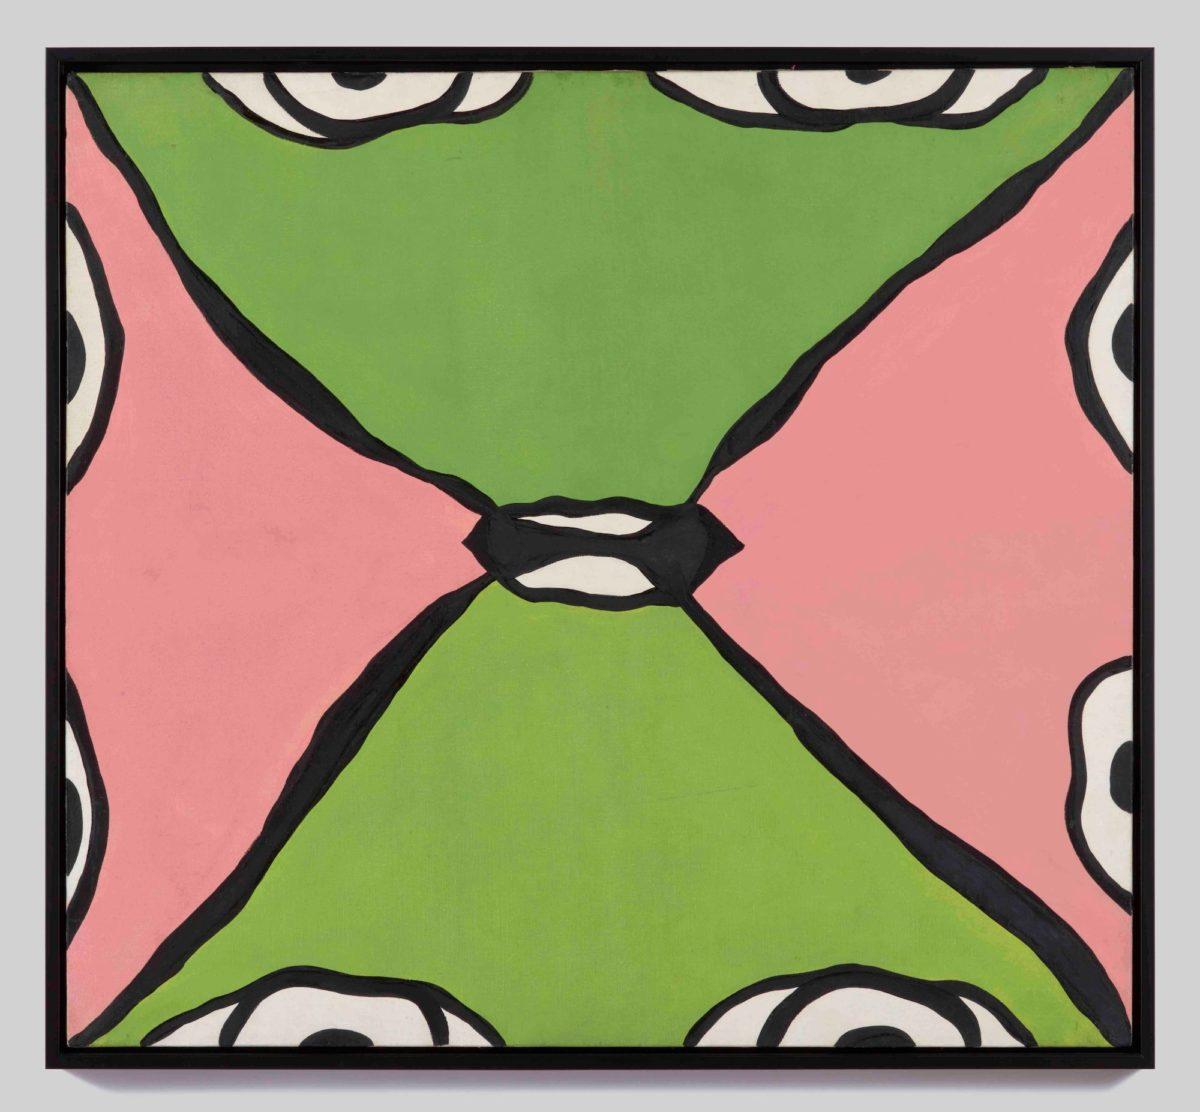 Tate St Ives_Huguette Caland_Kiss_1968